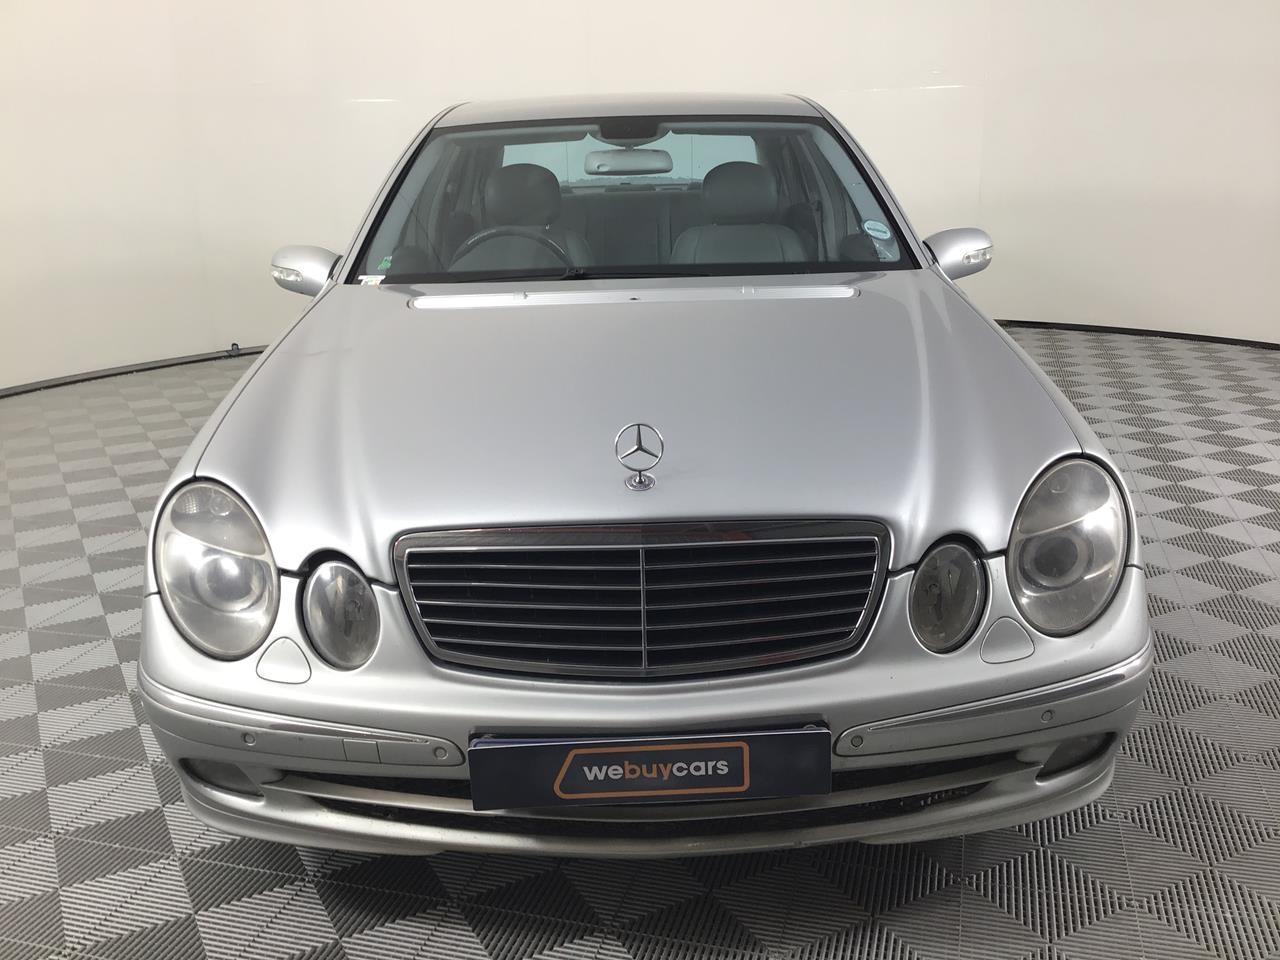 Used 2005 Mercedes-Benz E Class Sedan E 350 Avantgarde for ...